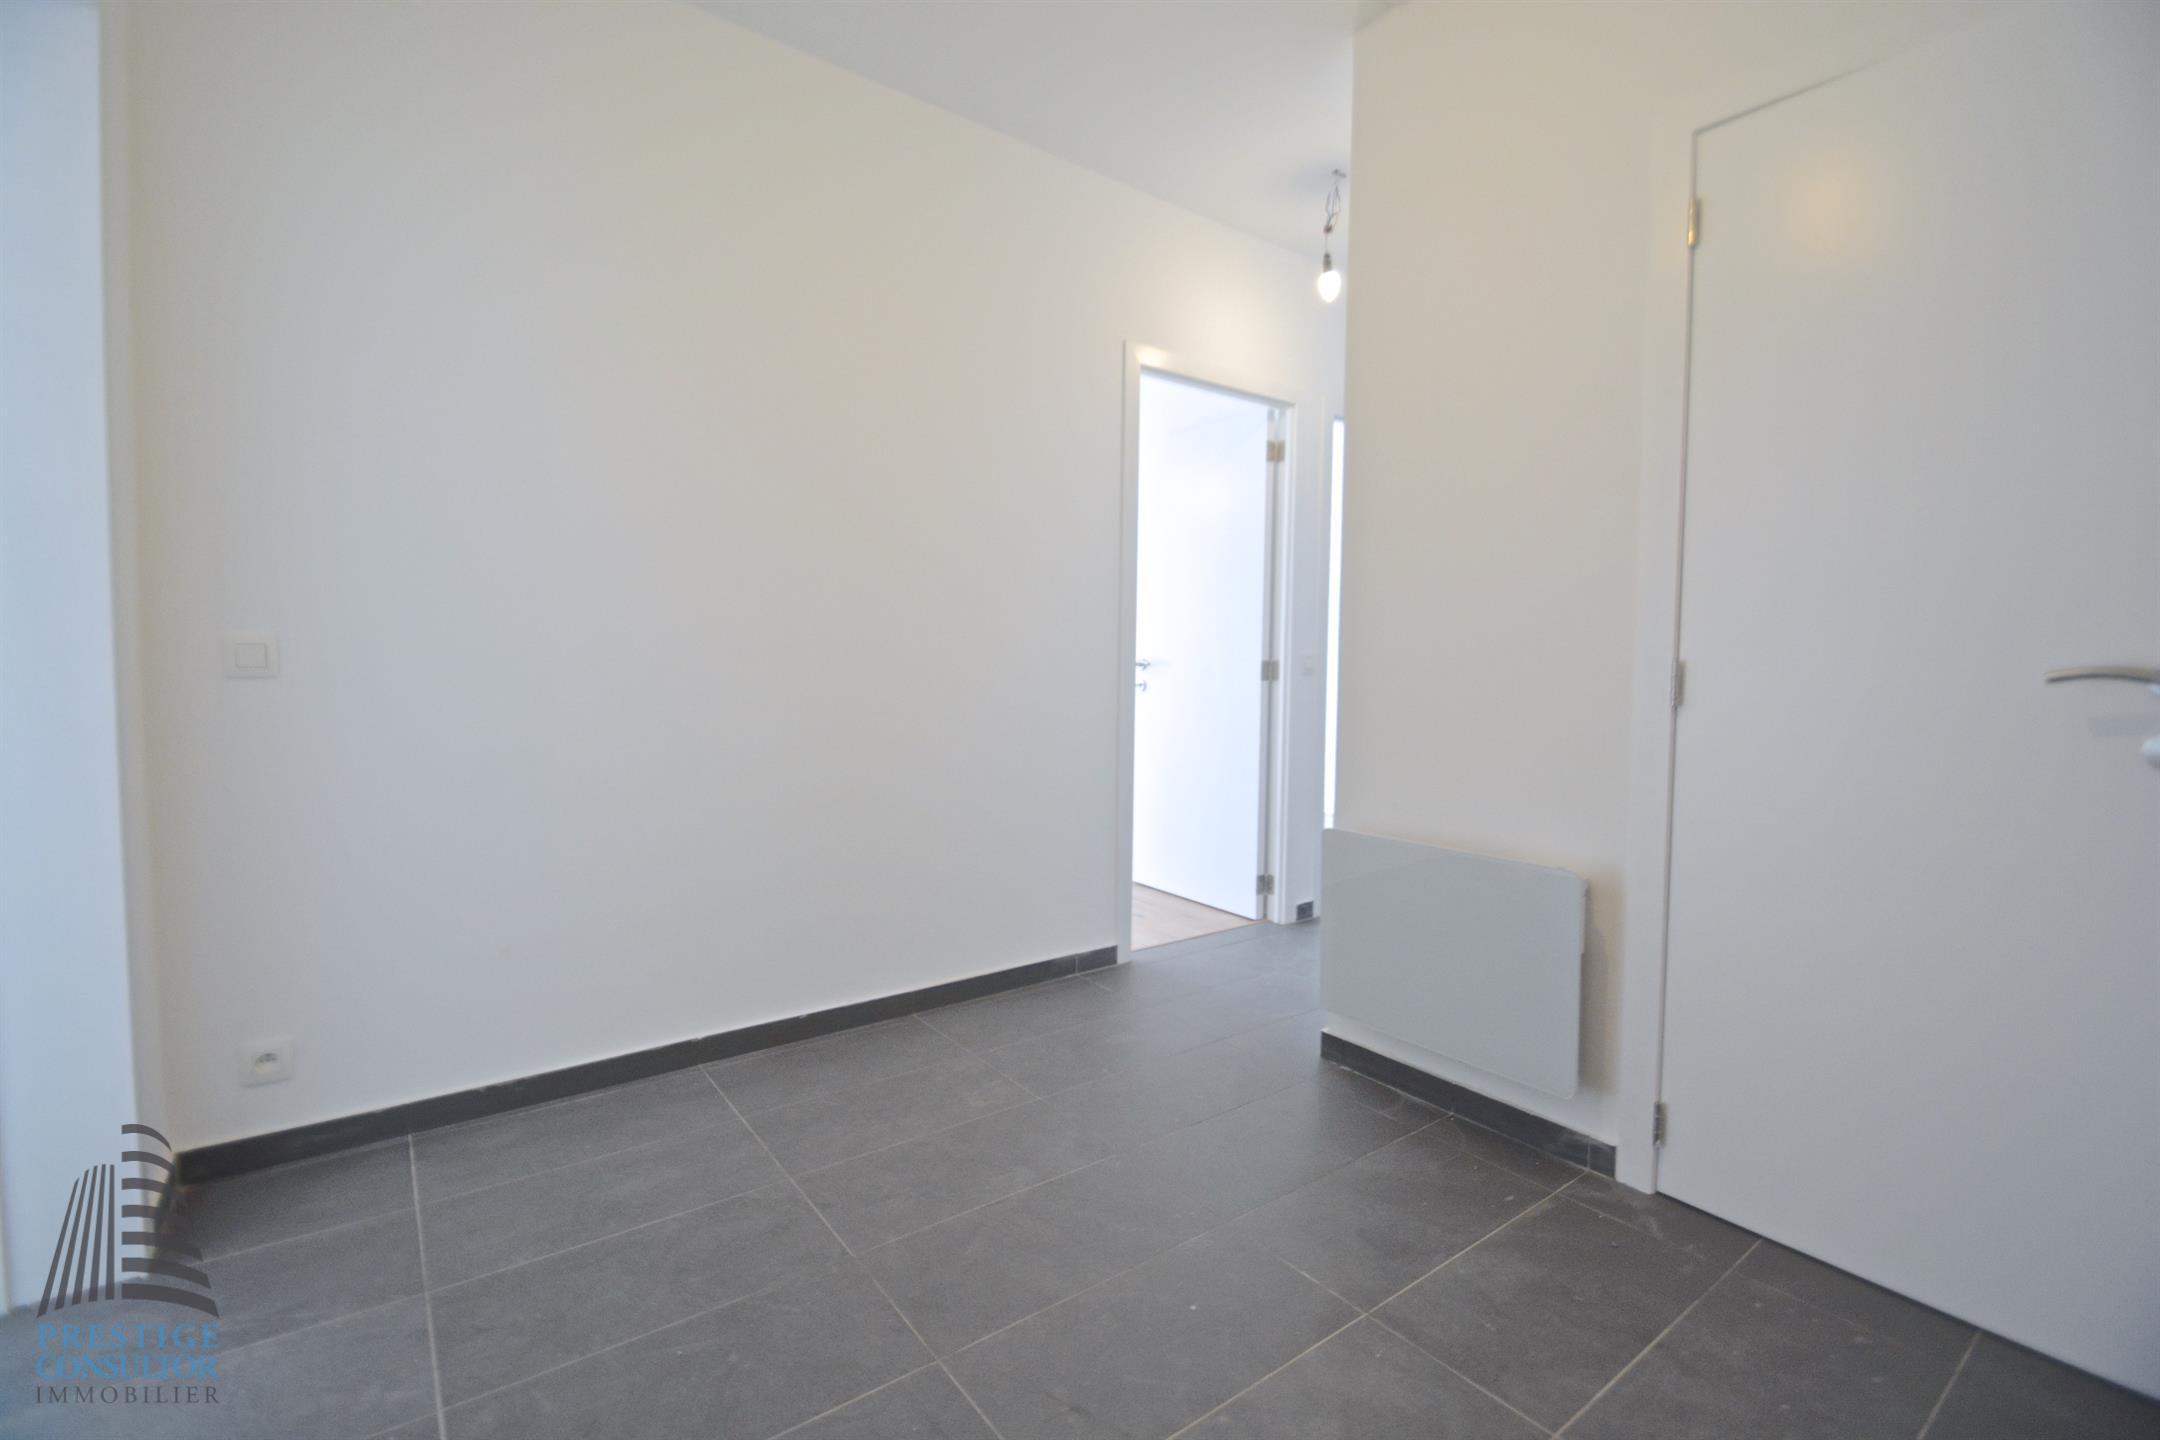 Appartement - Anderlecht - #3961138-4